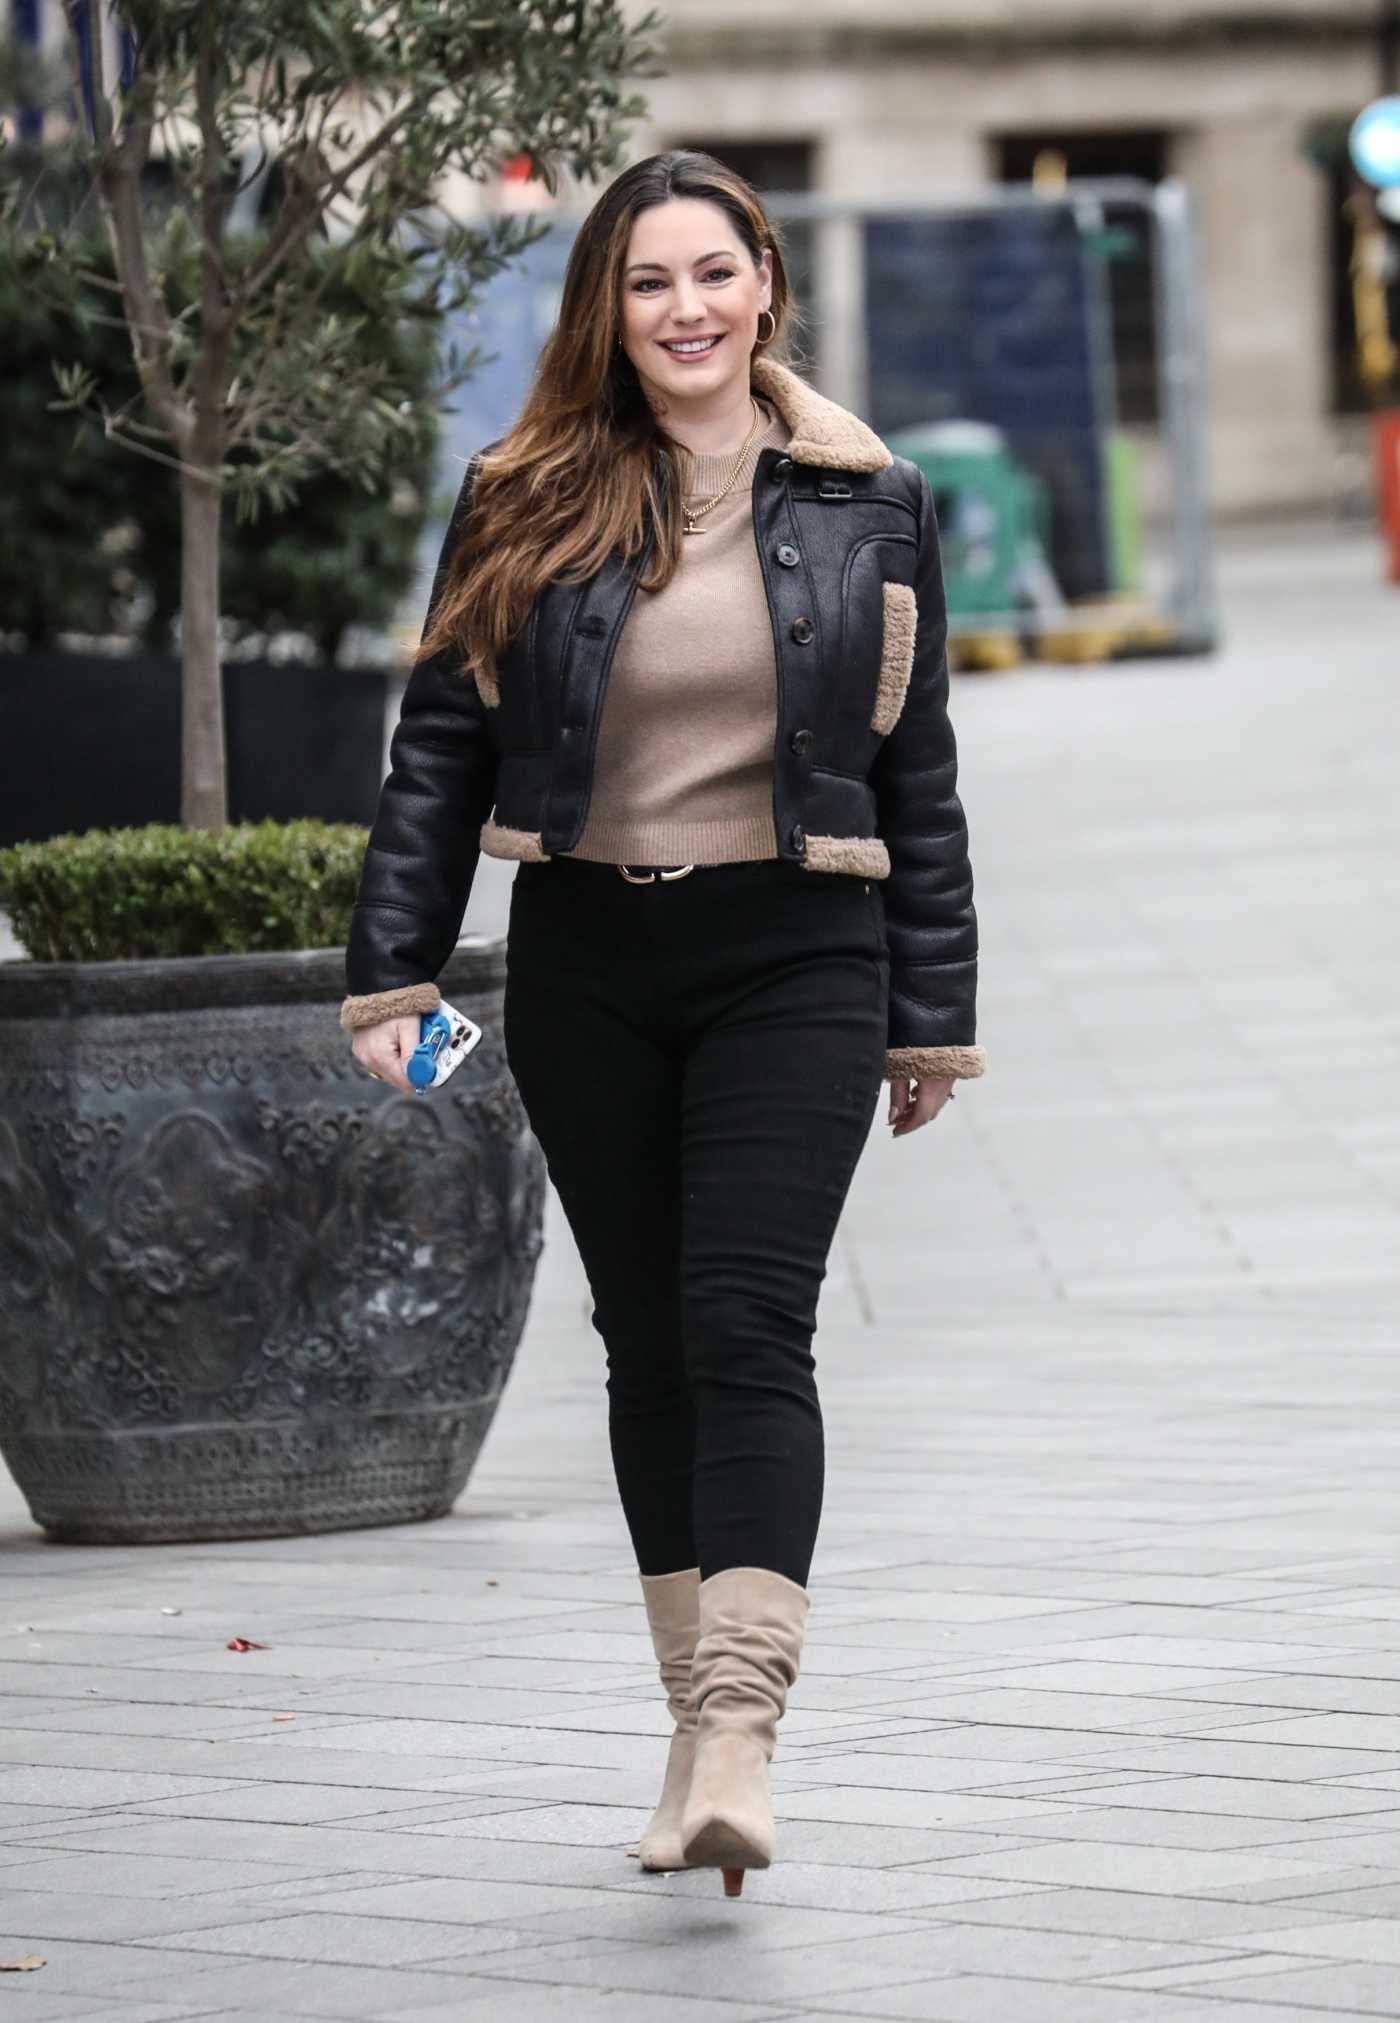 Kelly Brook in a Black Jacket Arrives at the Global Radio Studios in London 01/11/2021